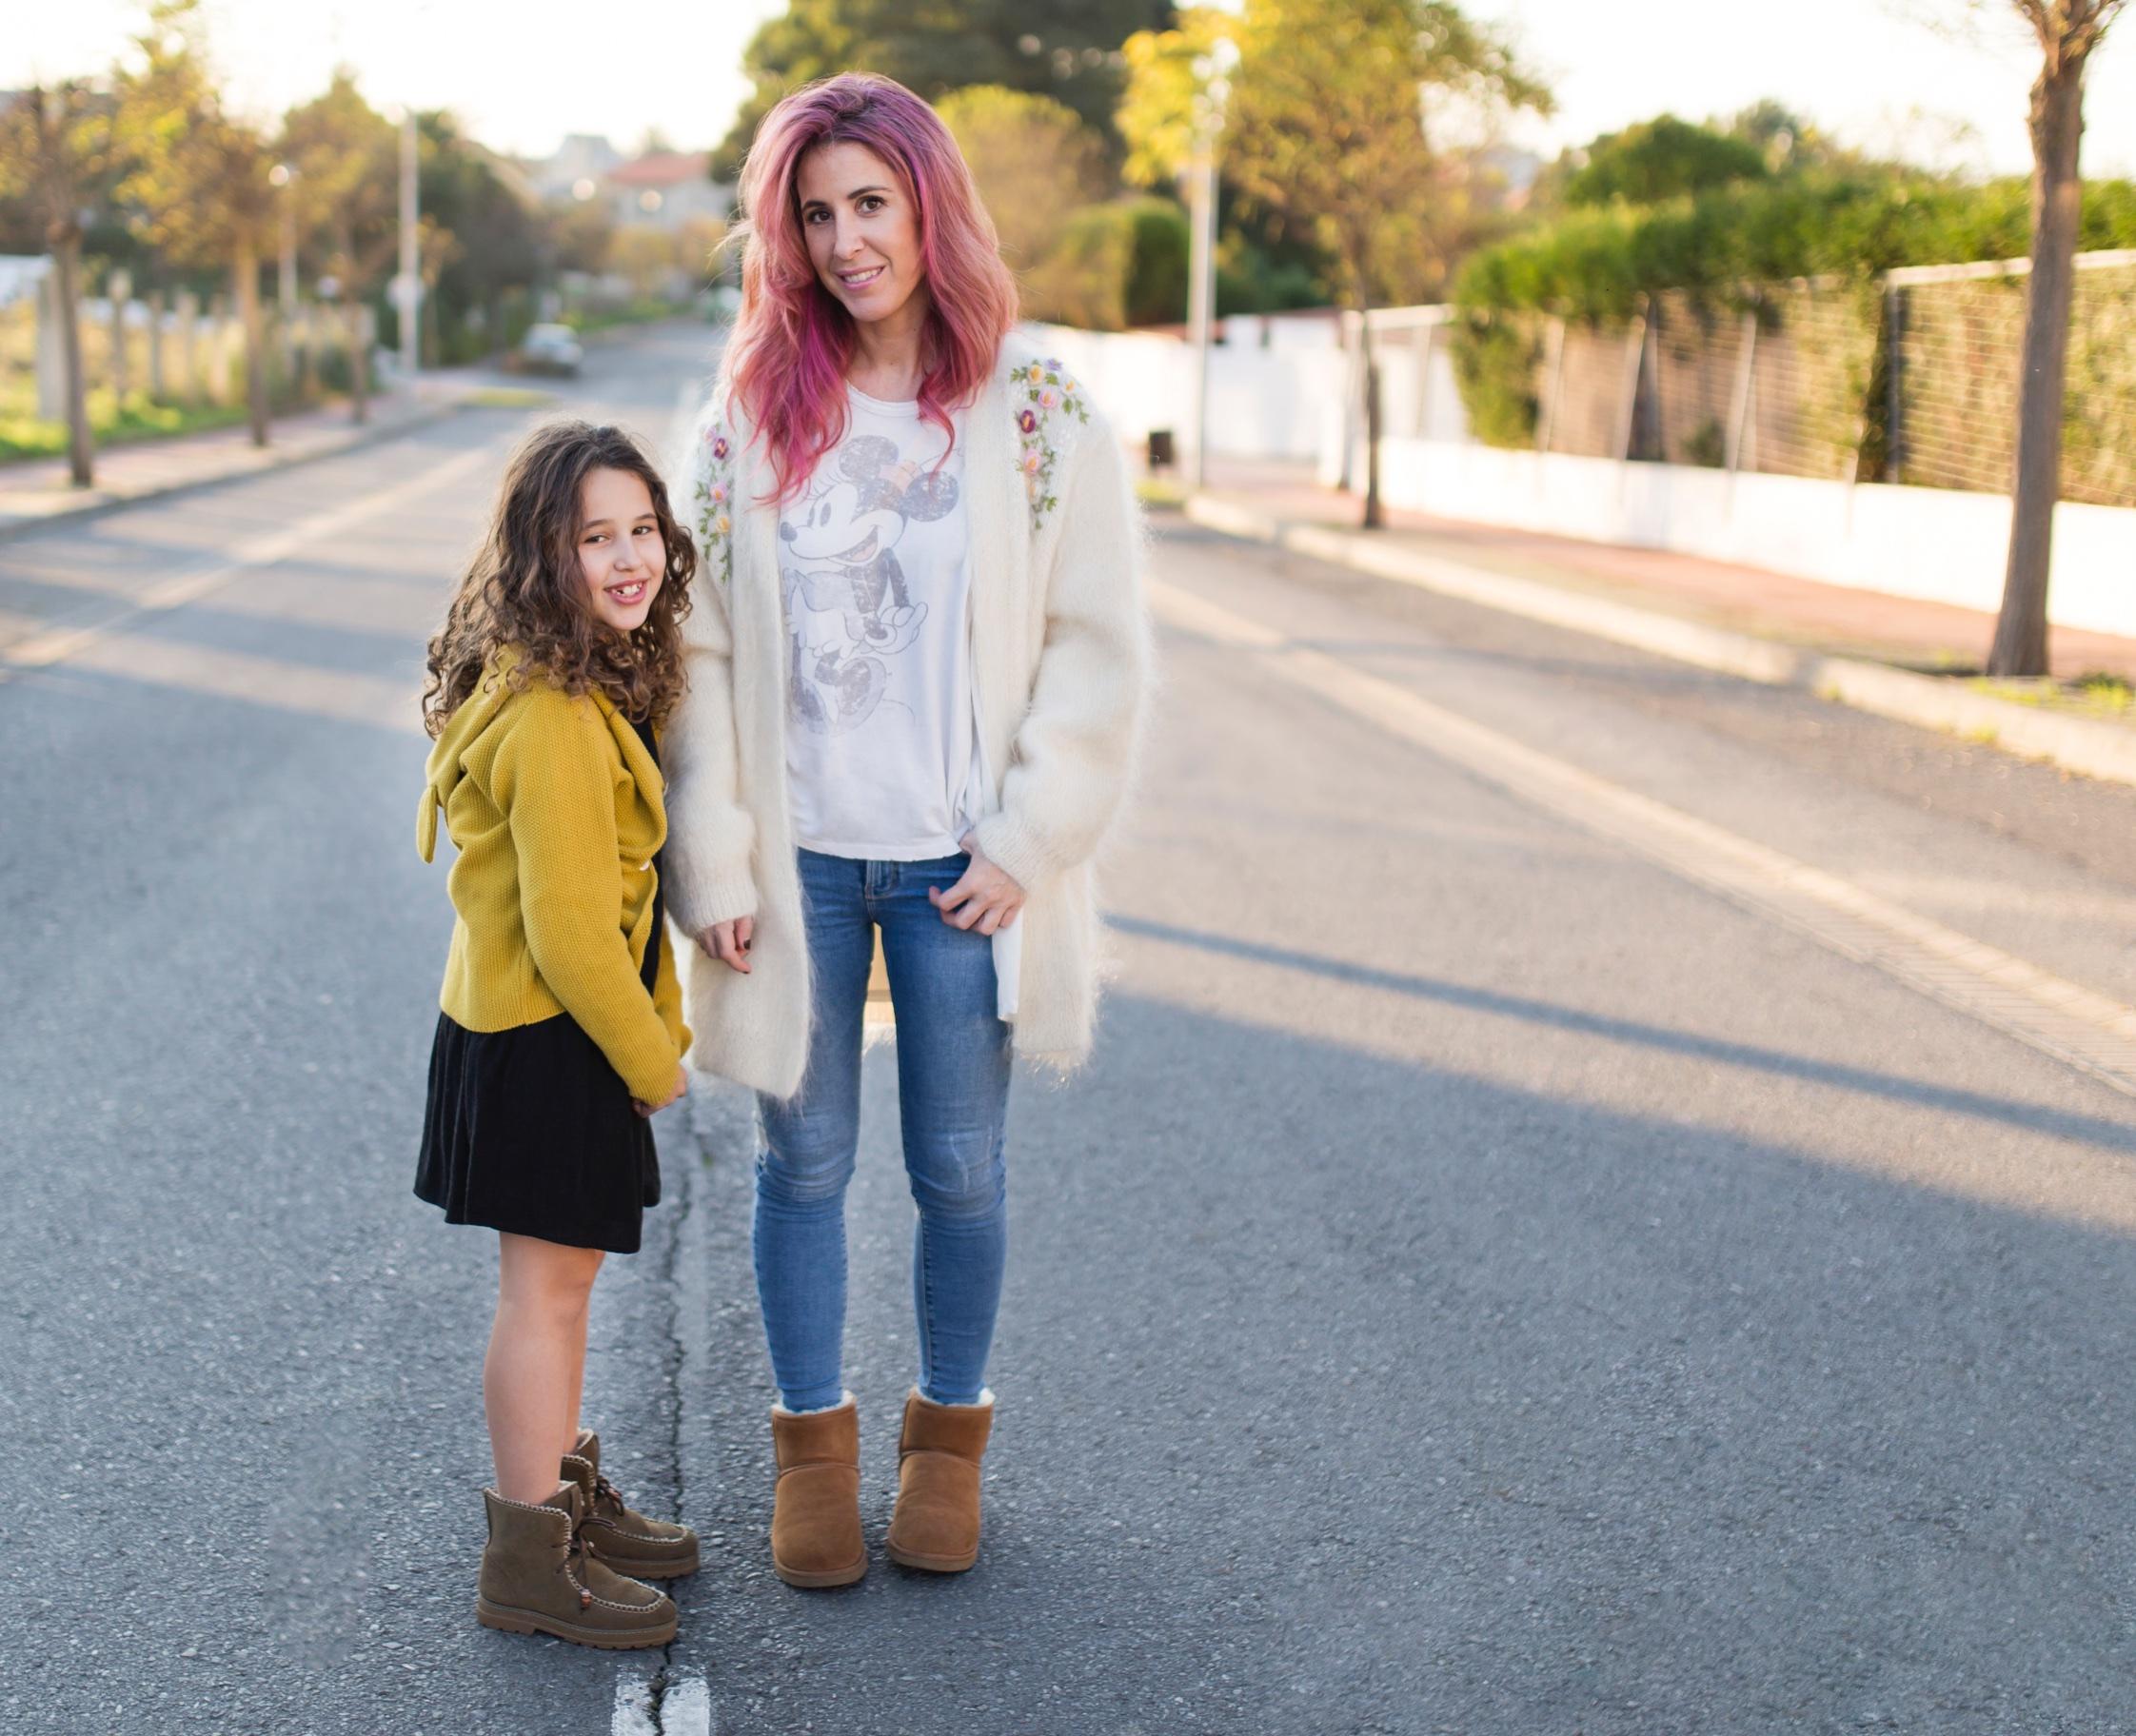 moda-madre-e-hija-descalzaporelparque-jimena-look-kids-omini-kids-ministyle-street style